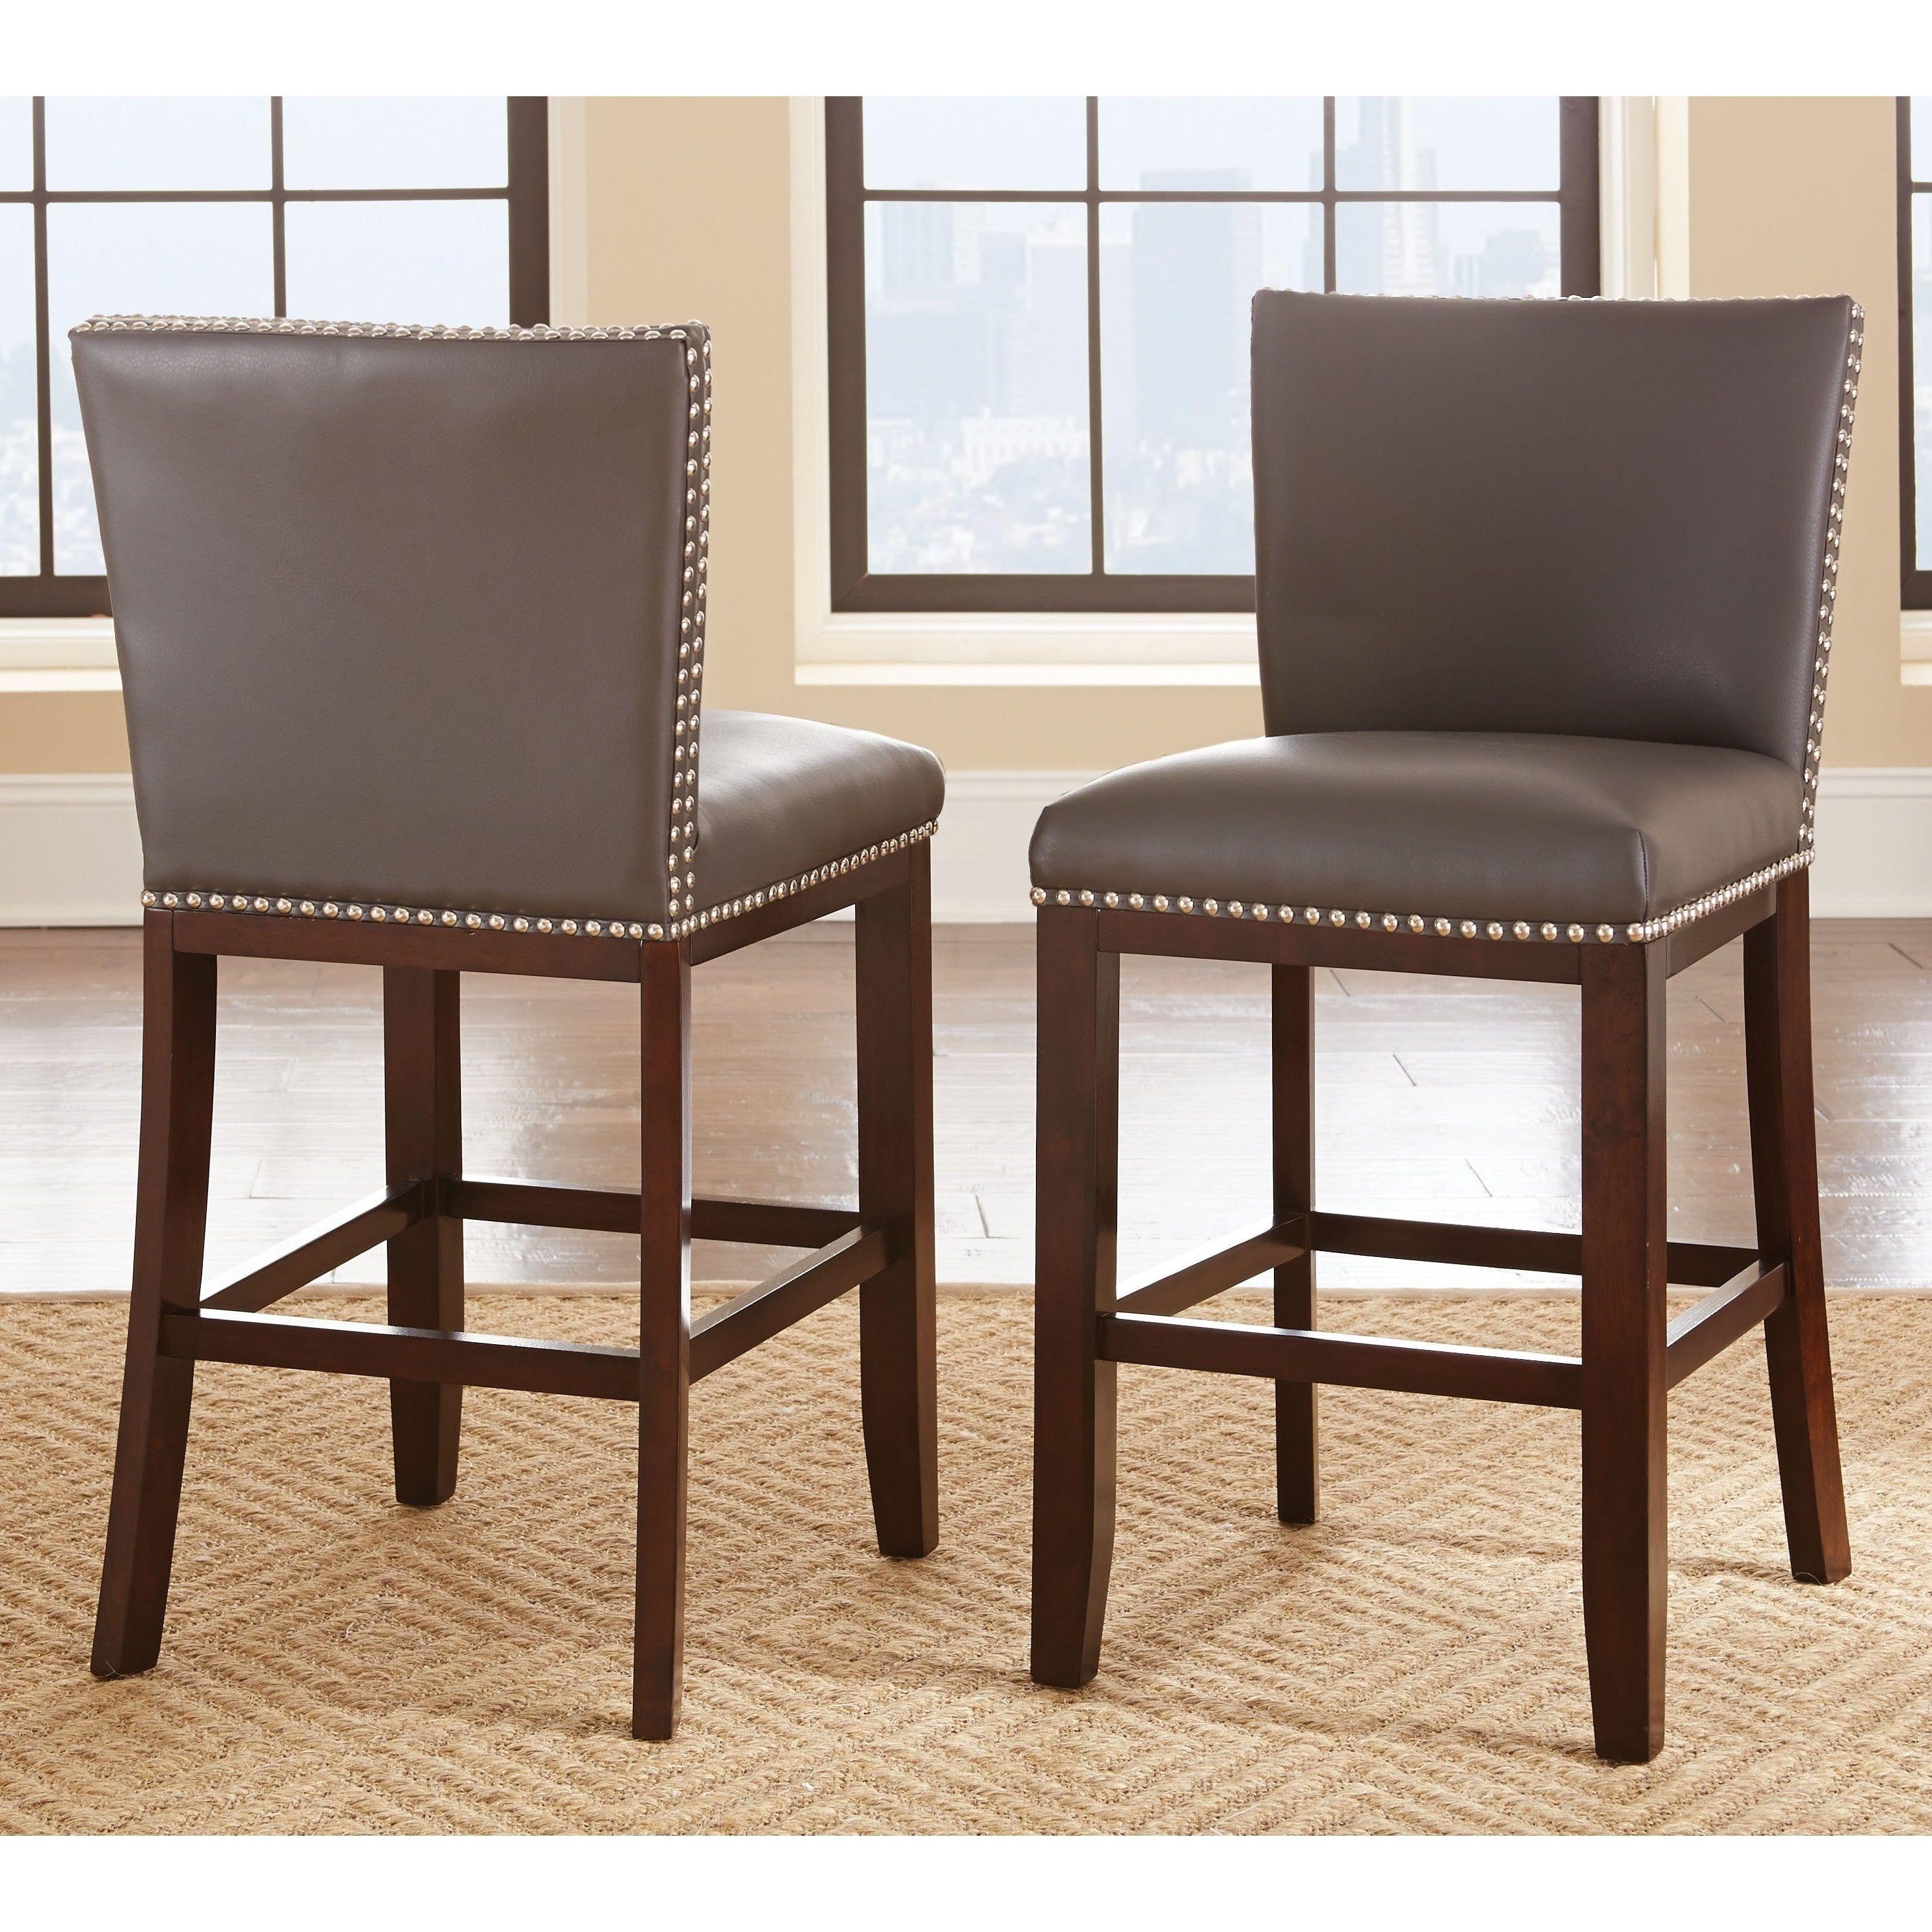 Peachy Tisbury 24 Inch Counter Height Stool By Greyson Living Set Evergreenethics Interior Chair Design Evergreenethicsorg